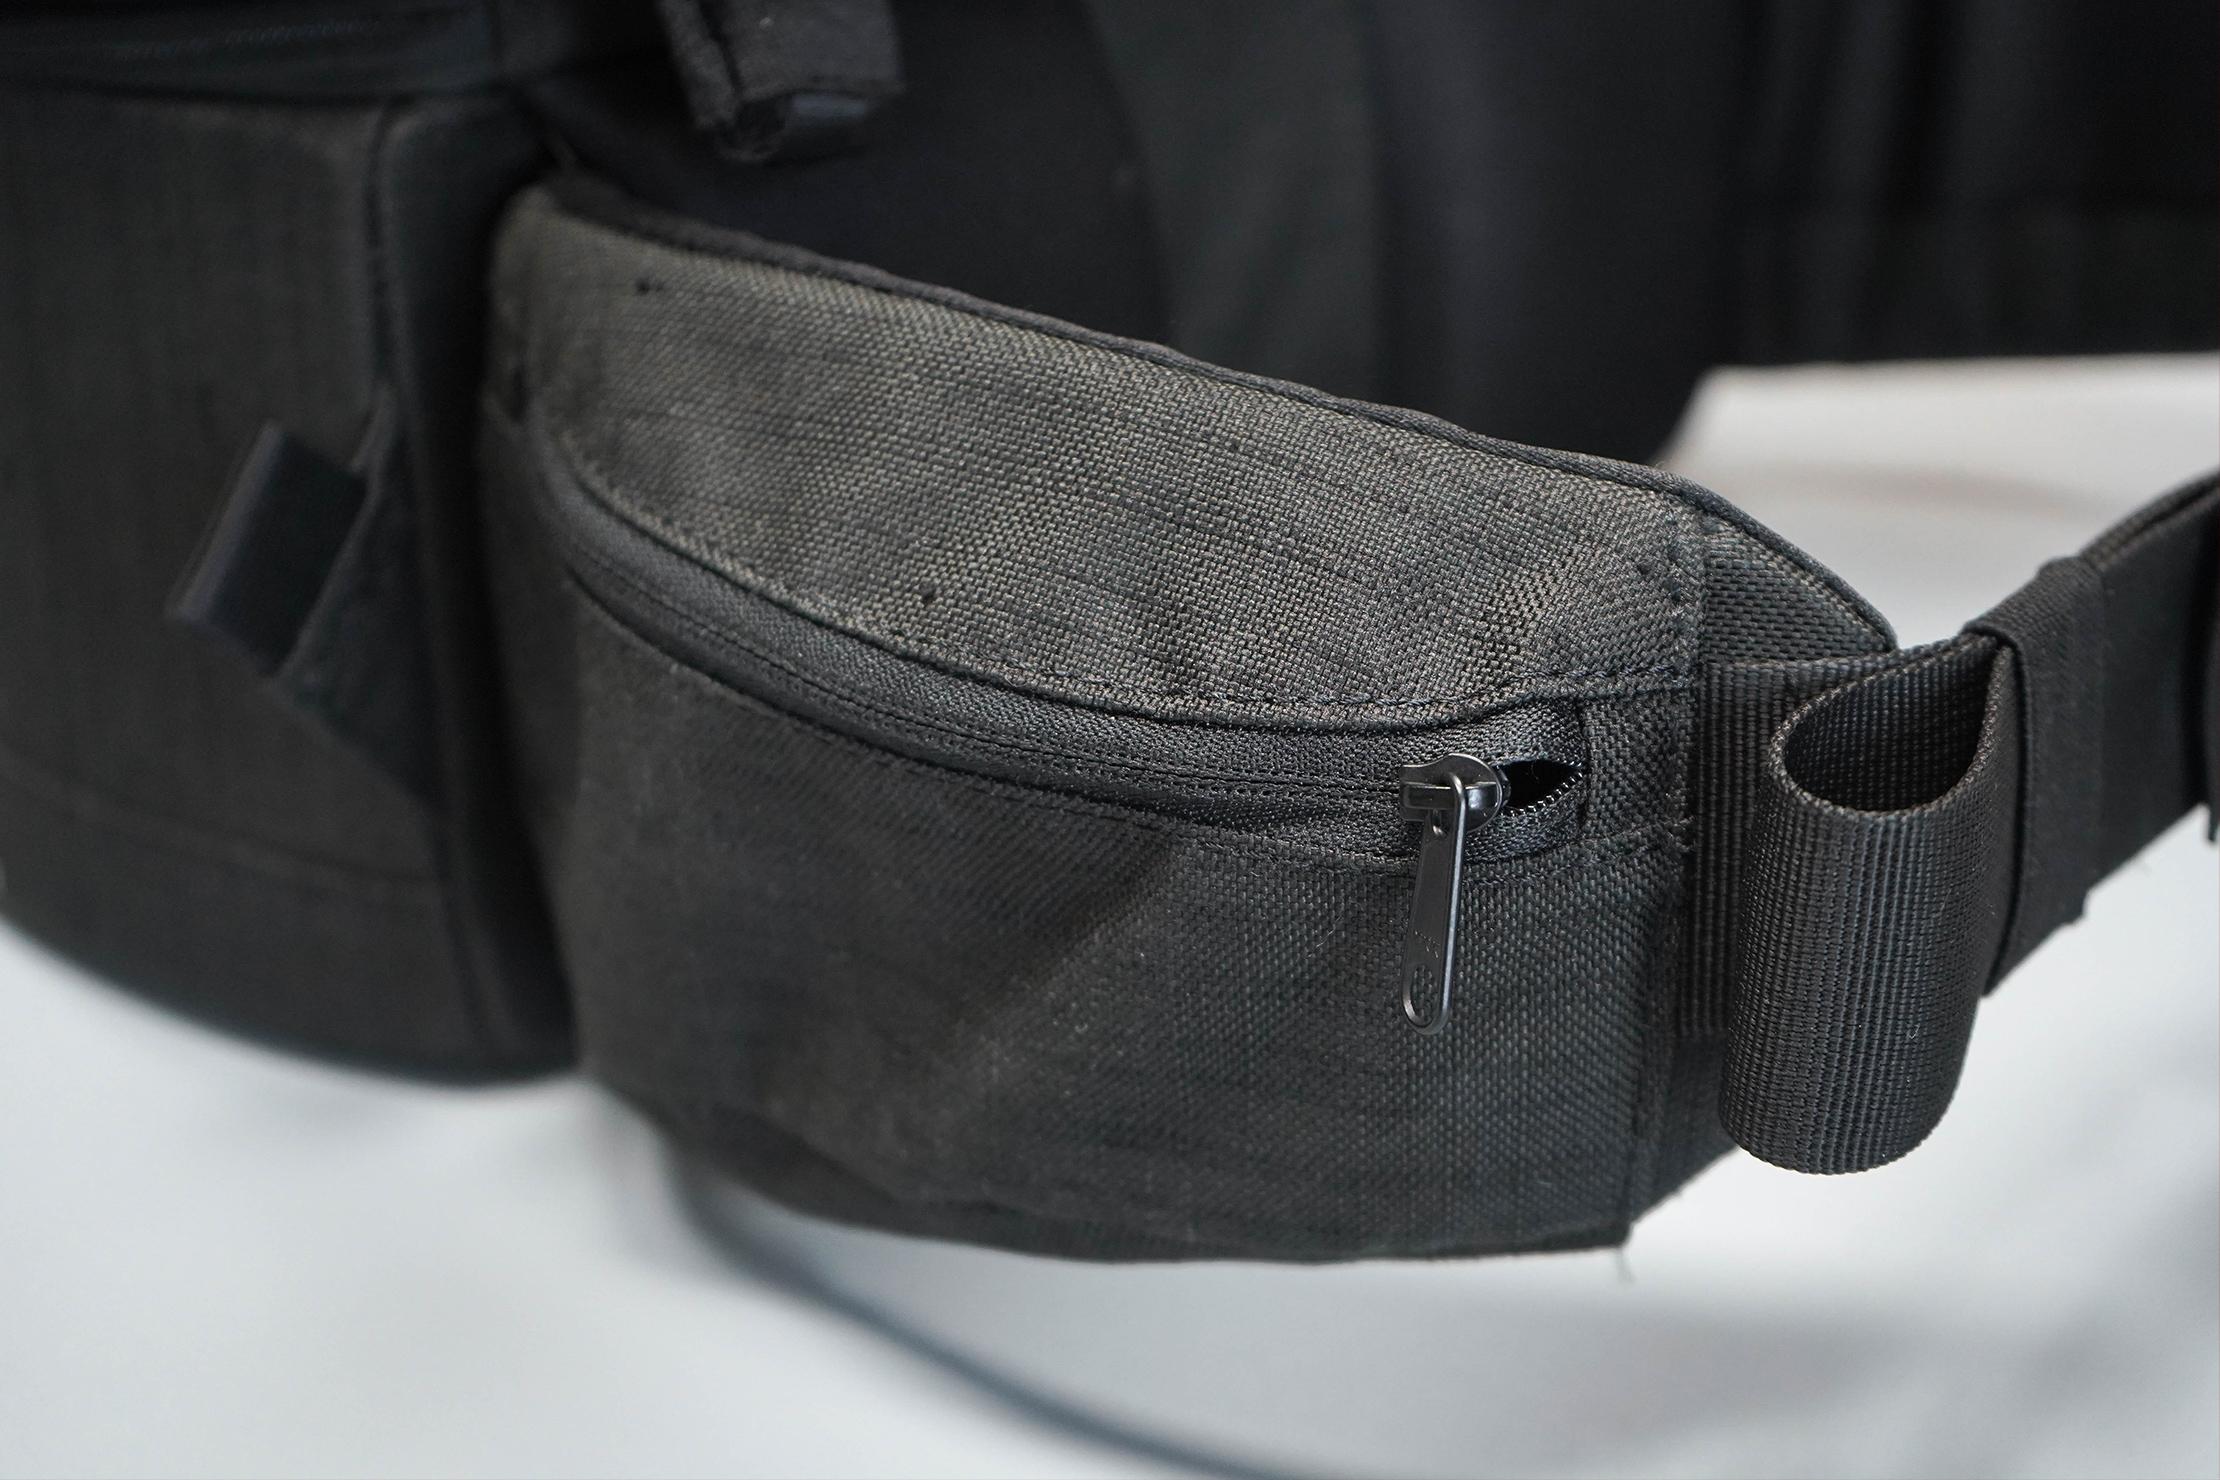 WAYKS ONE Hip Belt Pocket